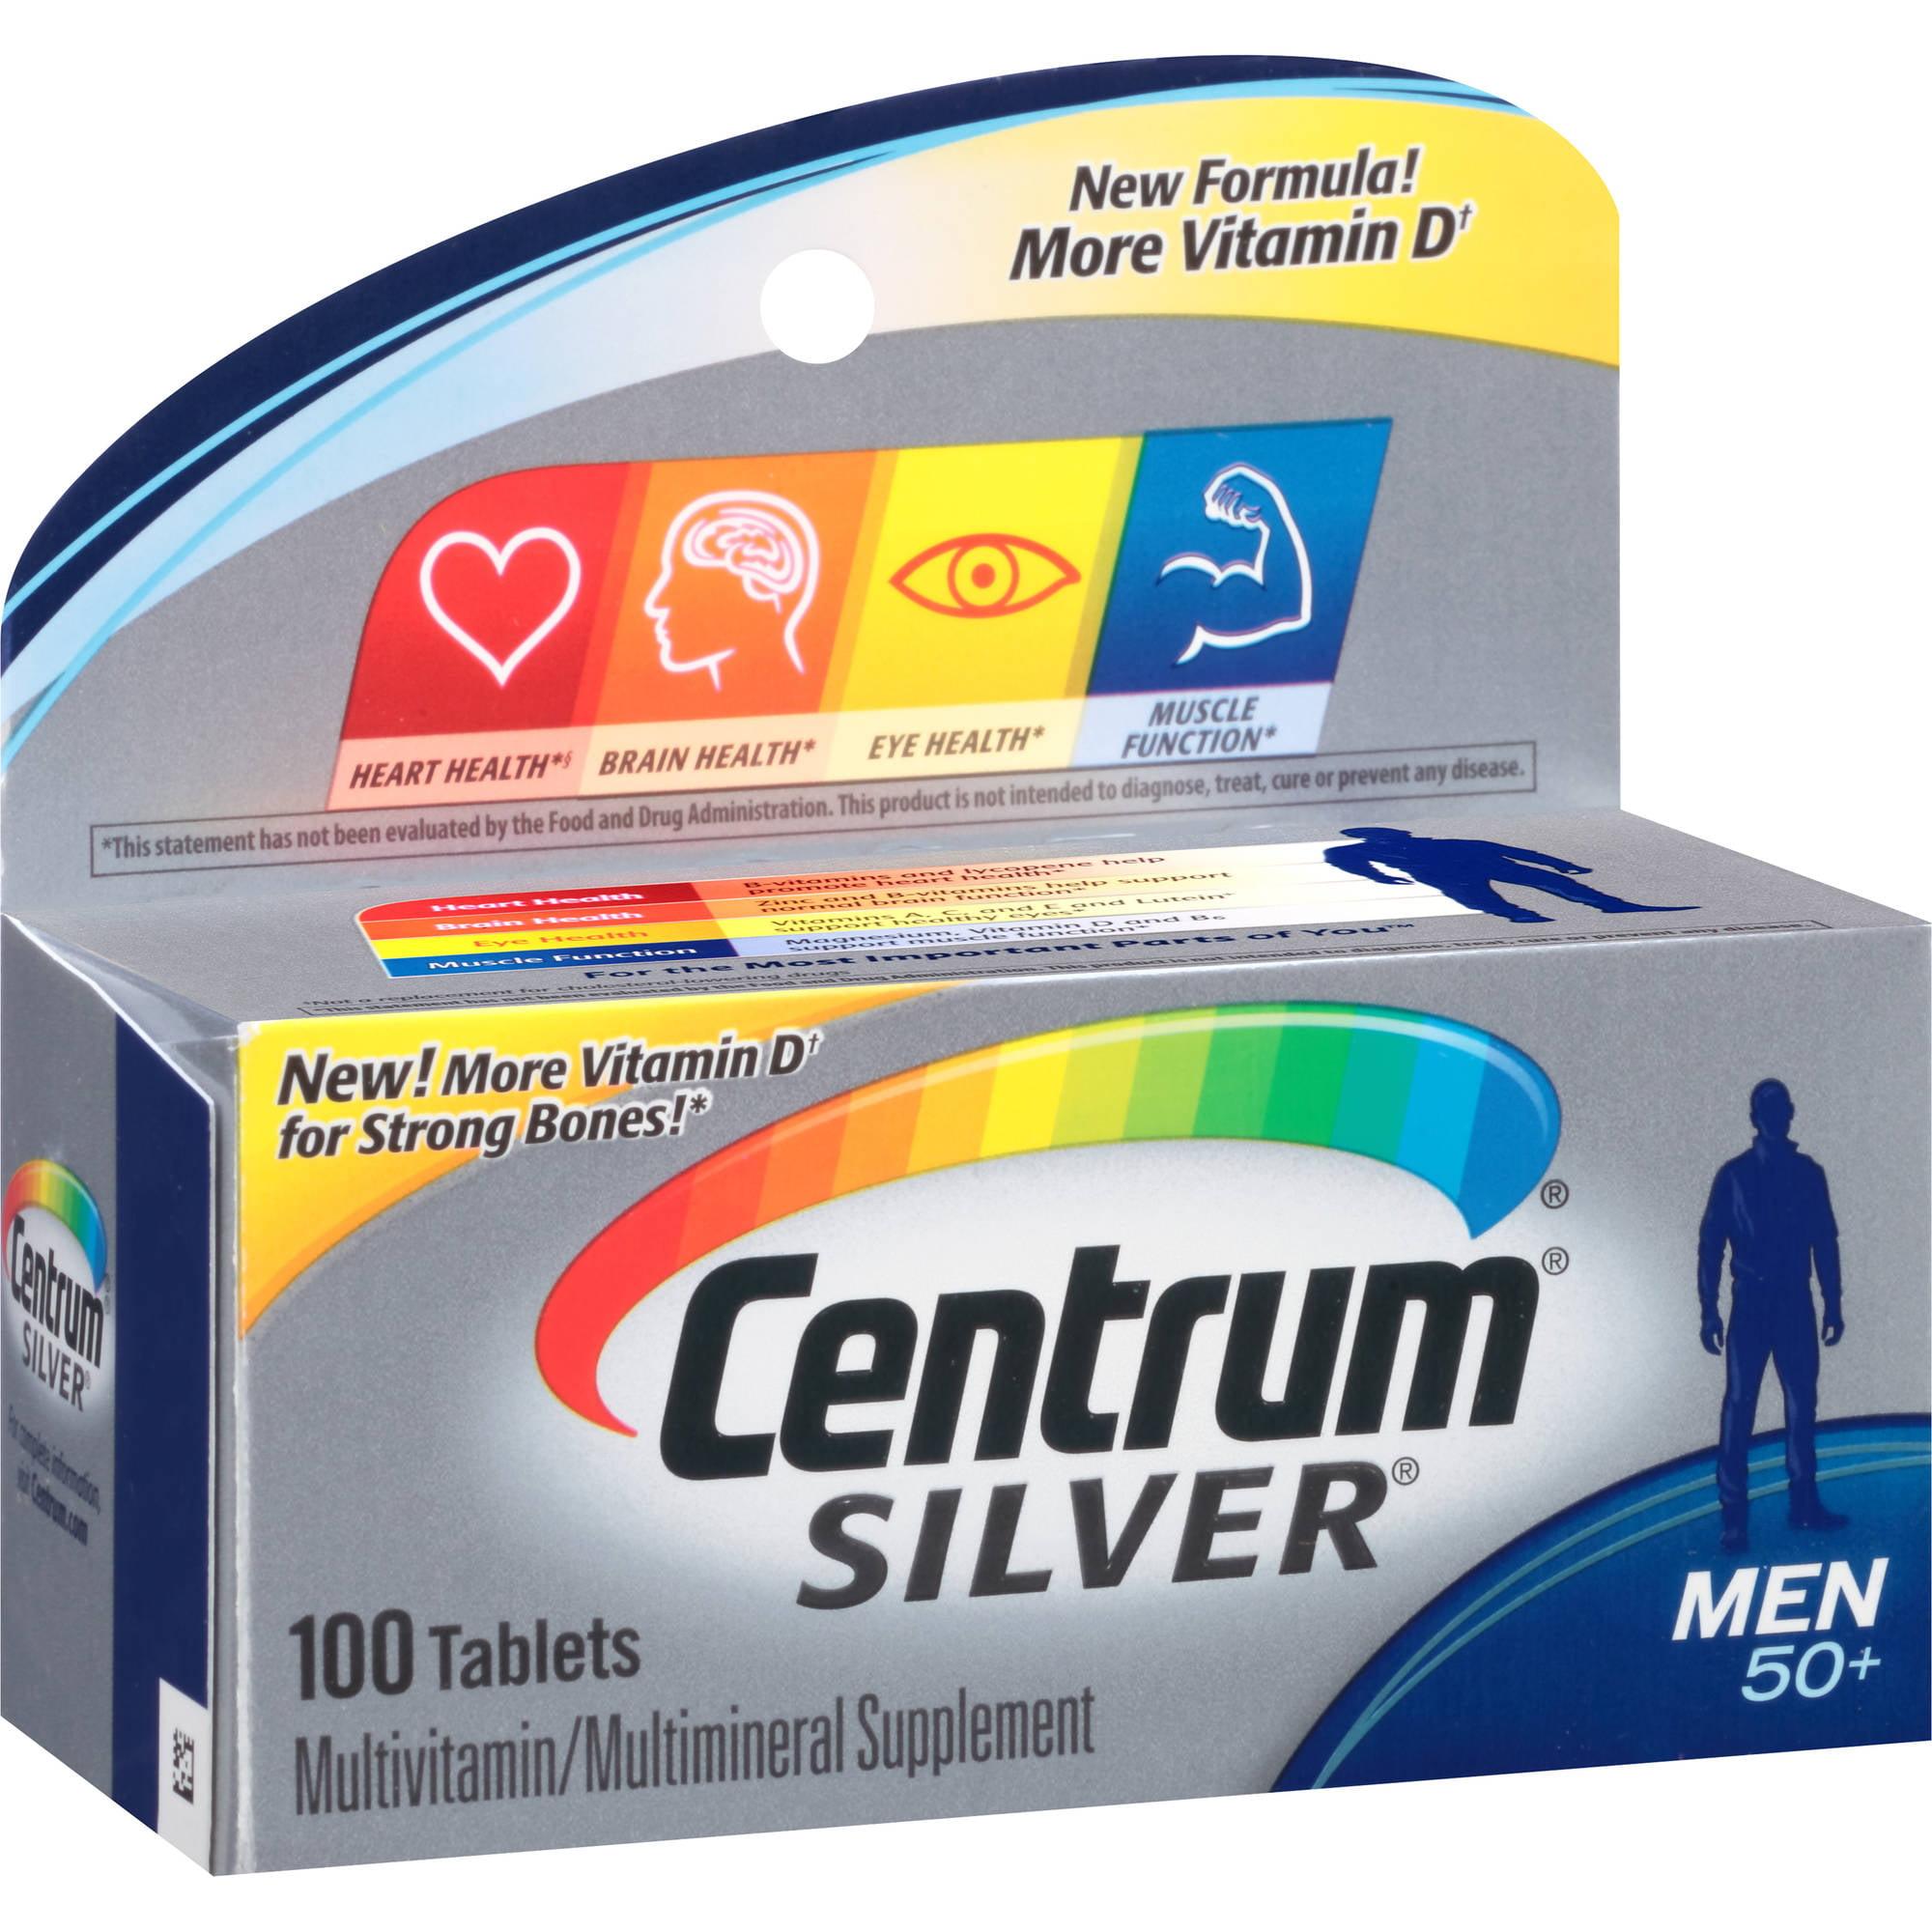 Centrum Silver Men Multivitamin/Multimineral Supplement 100 Count